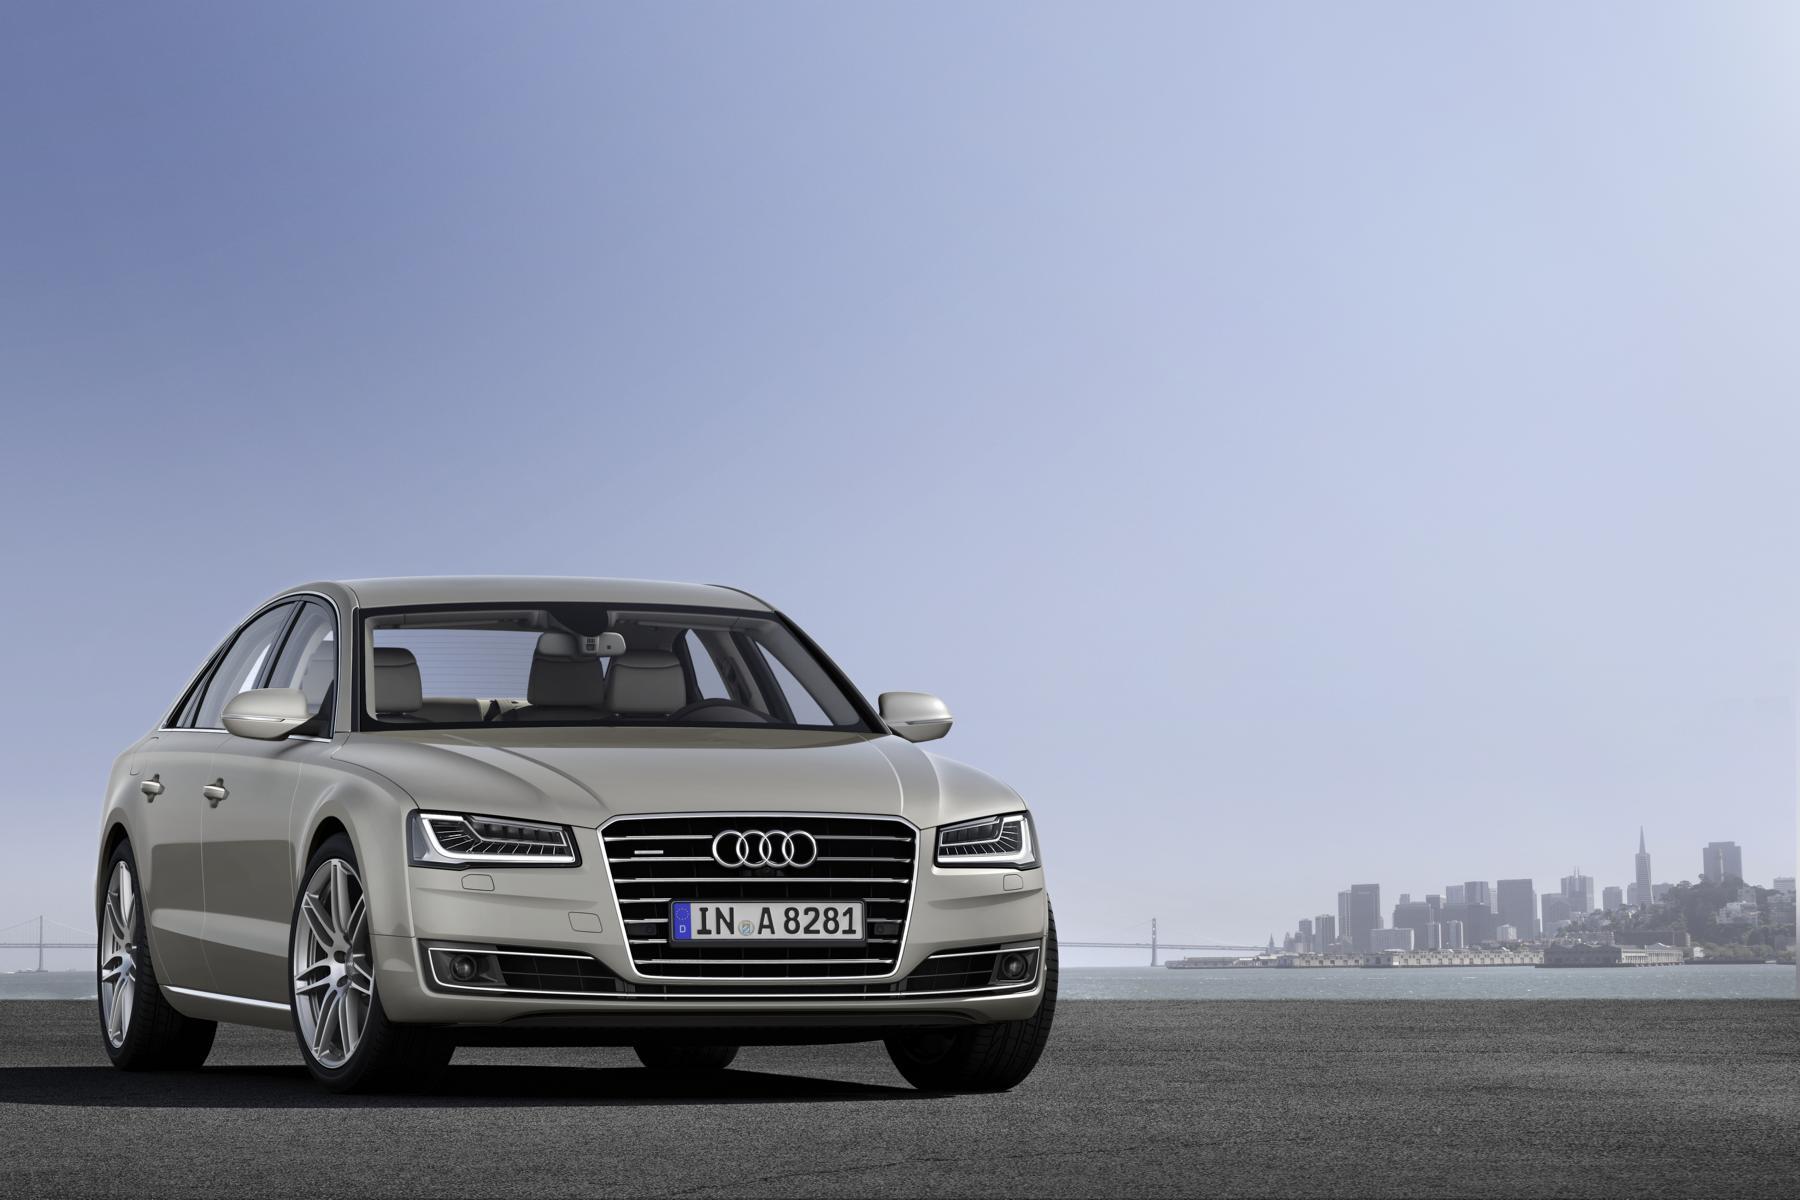 Audi_A8_TDI_01_34